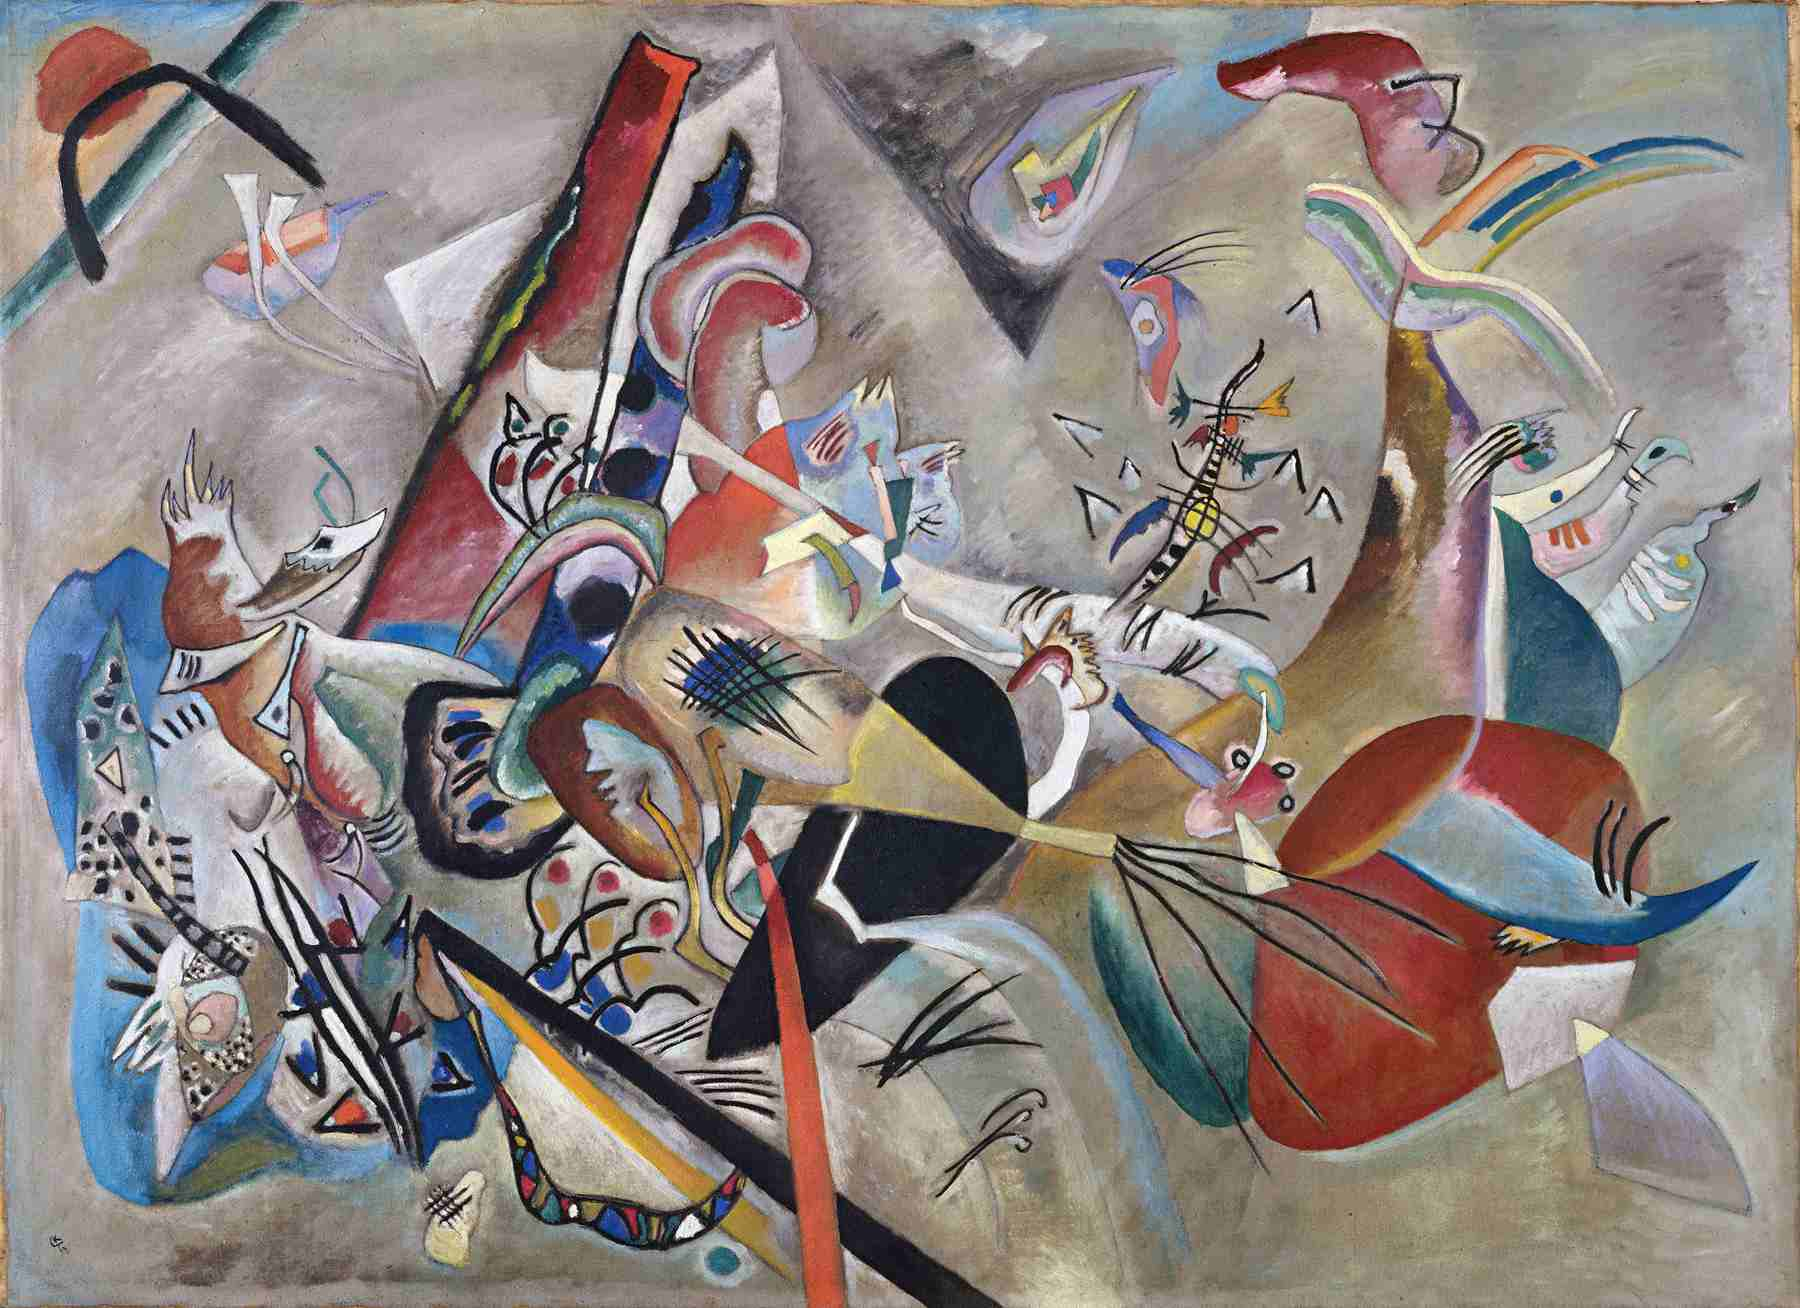 Wassily Kandinsky (Russian, 1866-1944) Wassily Kandinsky (Russian, 1866-1944). In Gray (Im Grau), 1919. Oil on canvas. 50 3/4 x 69 1/4 in. (129 x 176 cm). Bequest of Nina Kandinsky, 1981. Musée national d'art moderne, Centre Pompidou, Paris.